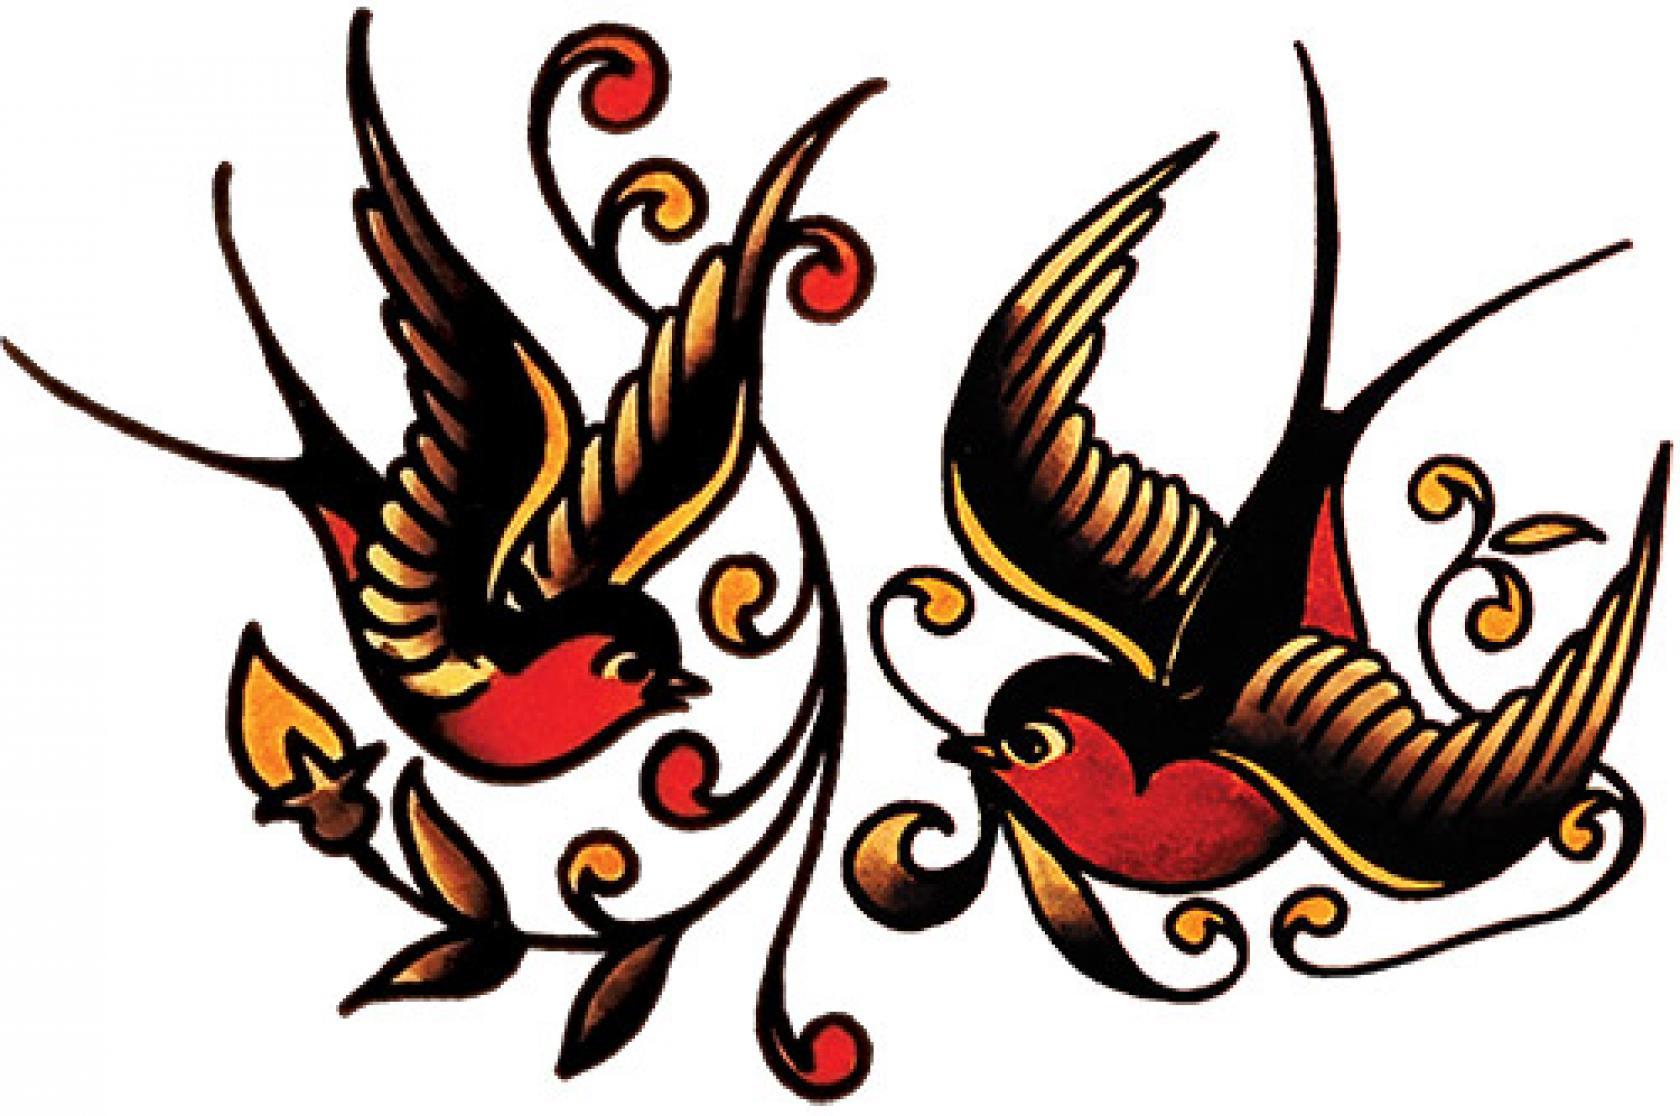 SetWidth1680-sailor-jerry-swallow-tattoo-design.jpg